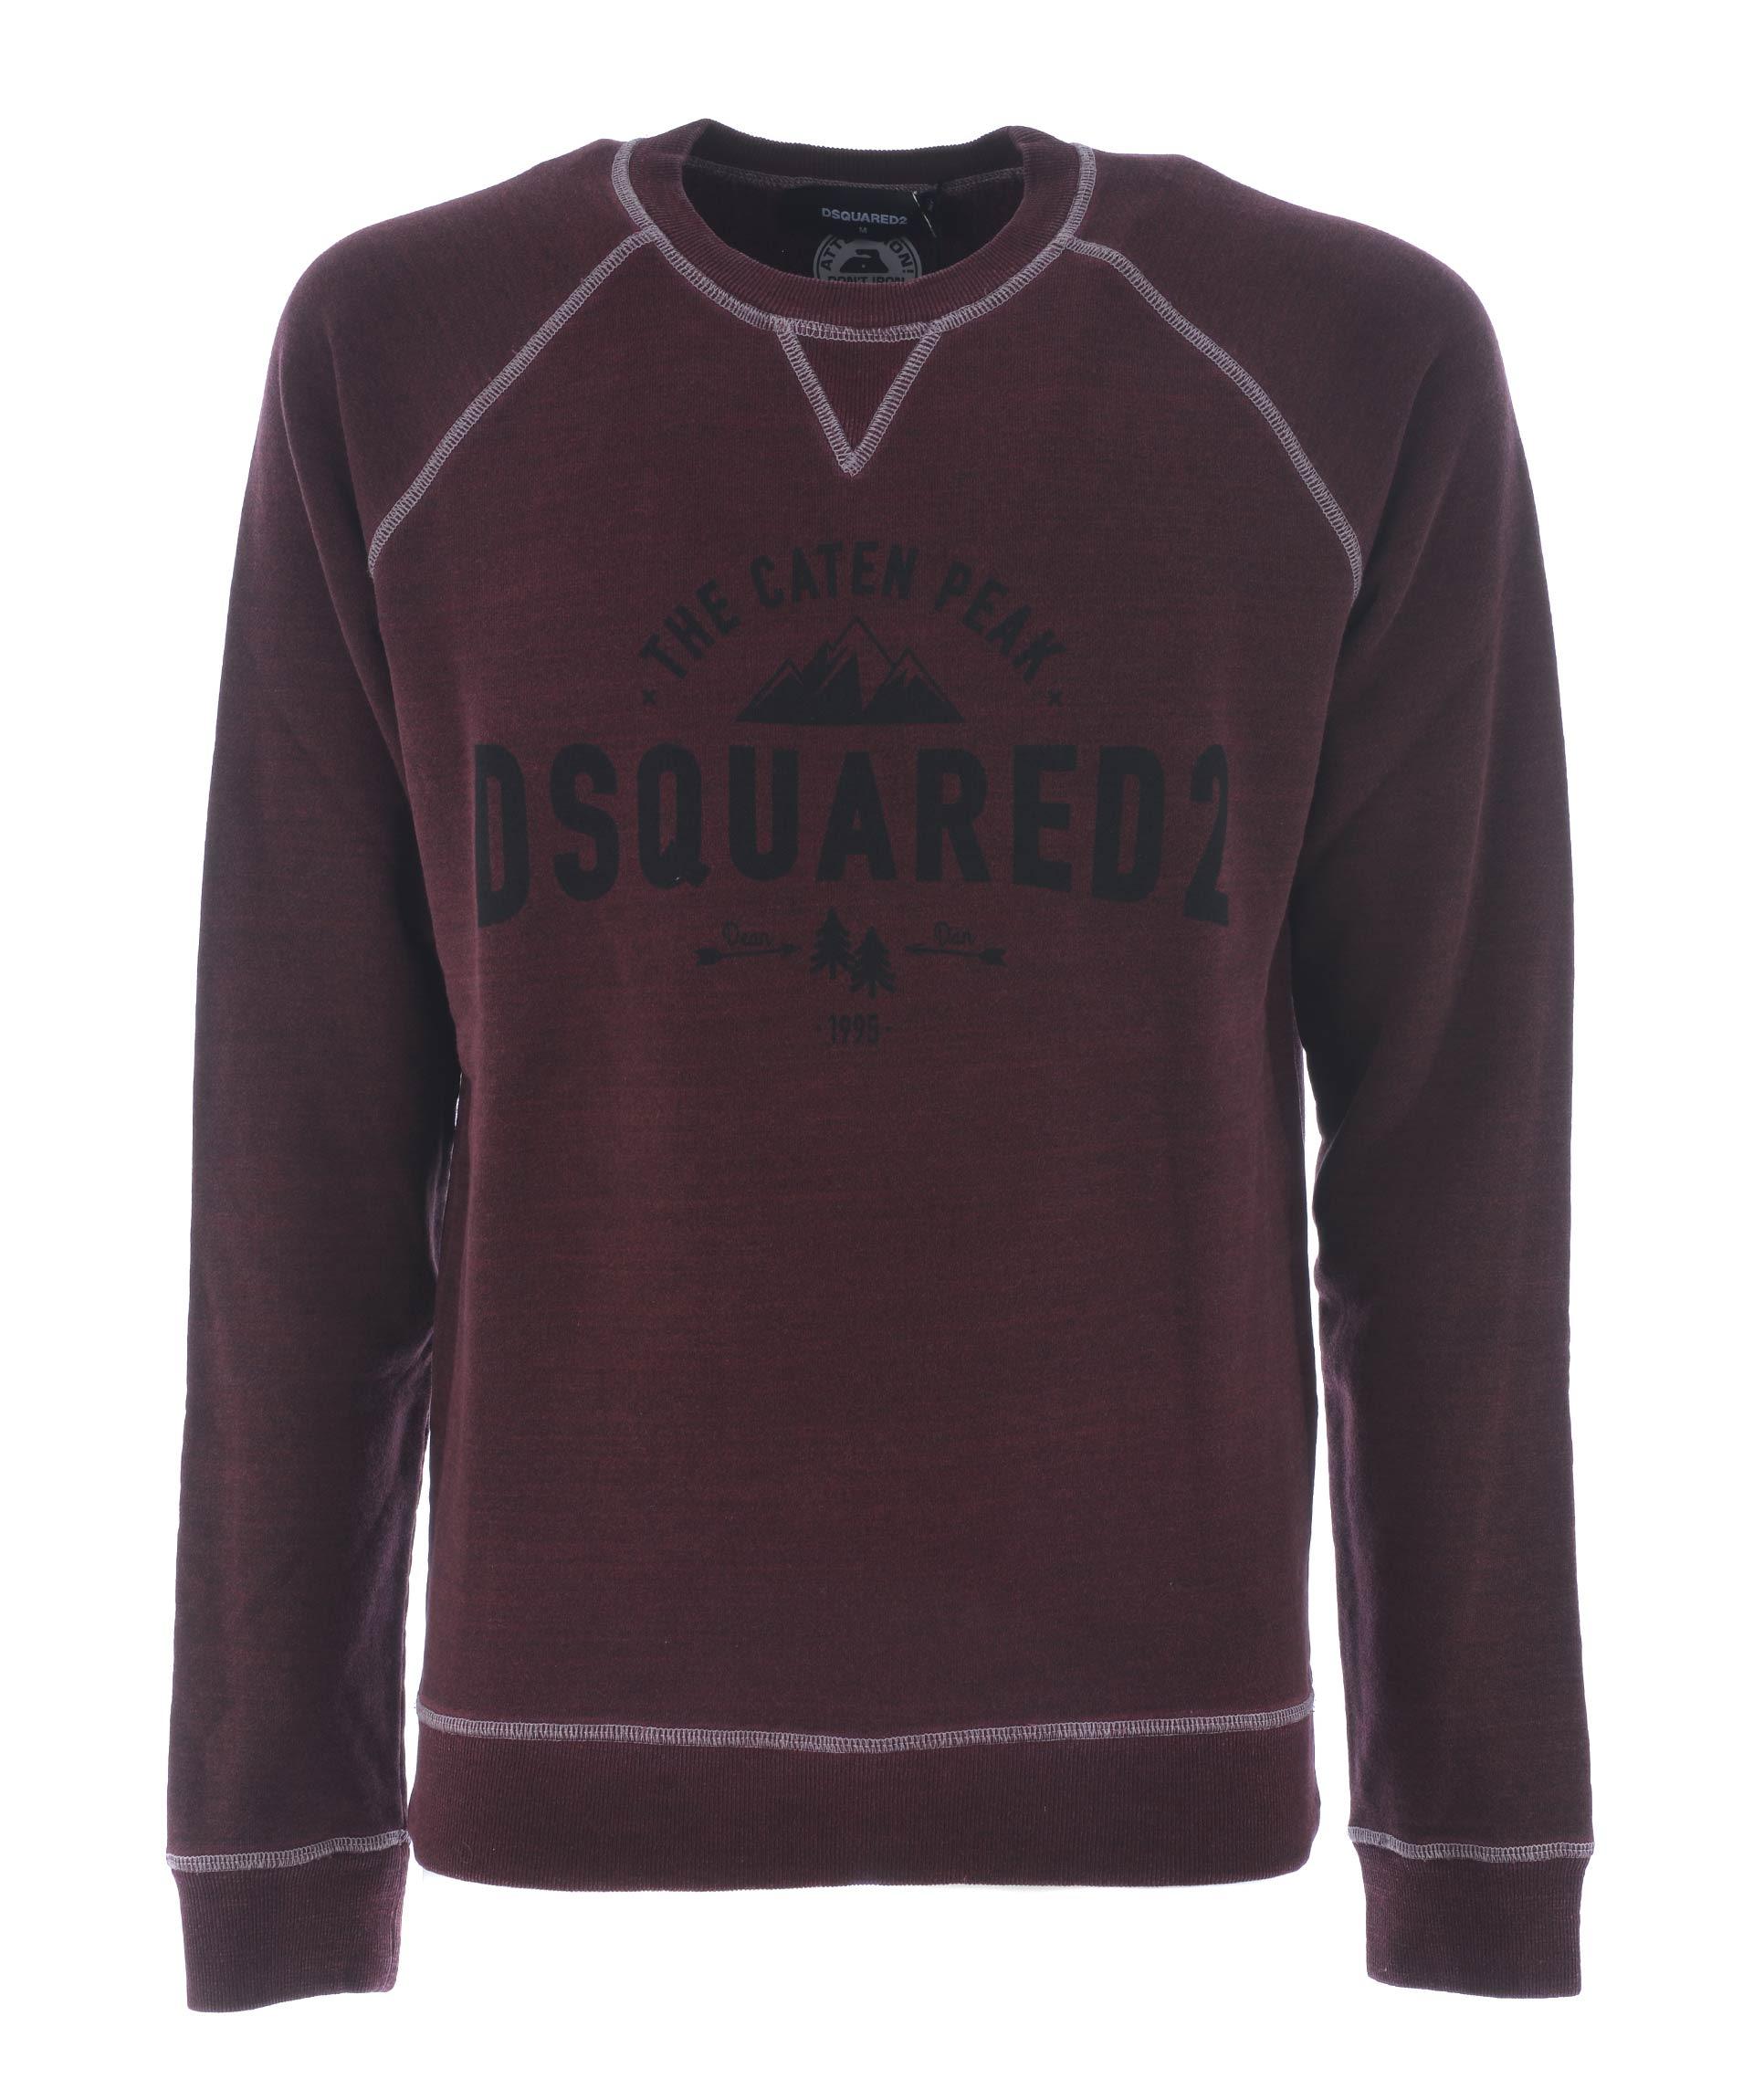 Dsquared2 Caten Peak Sweatshirt